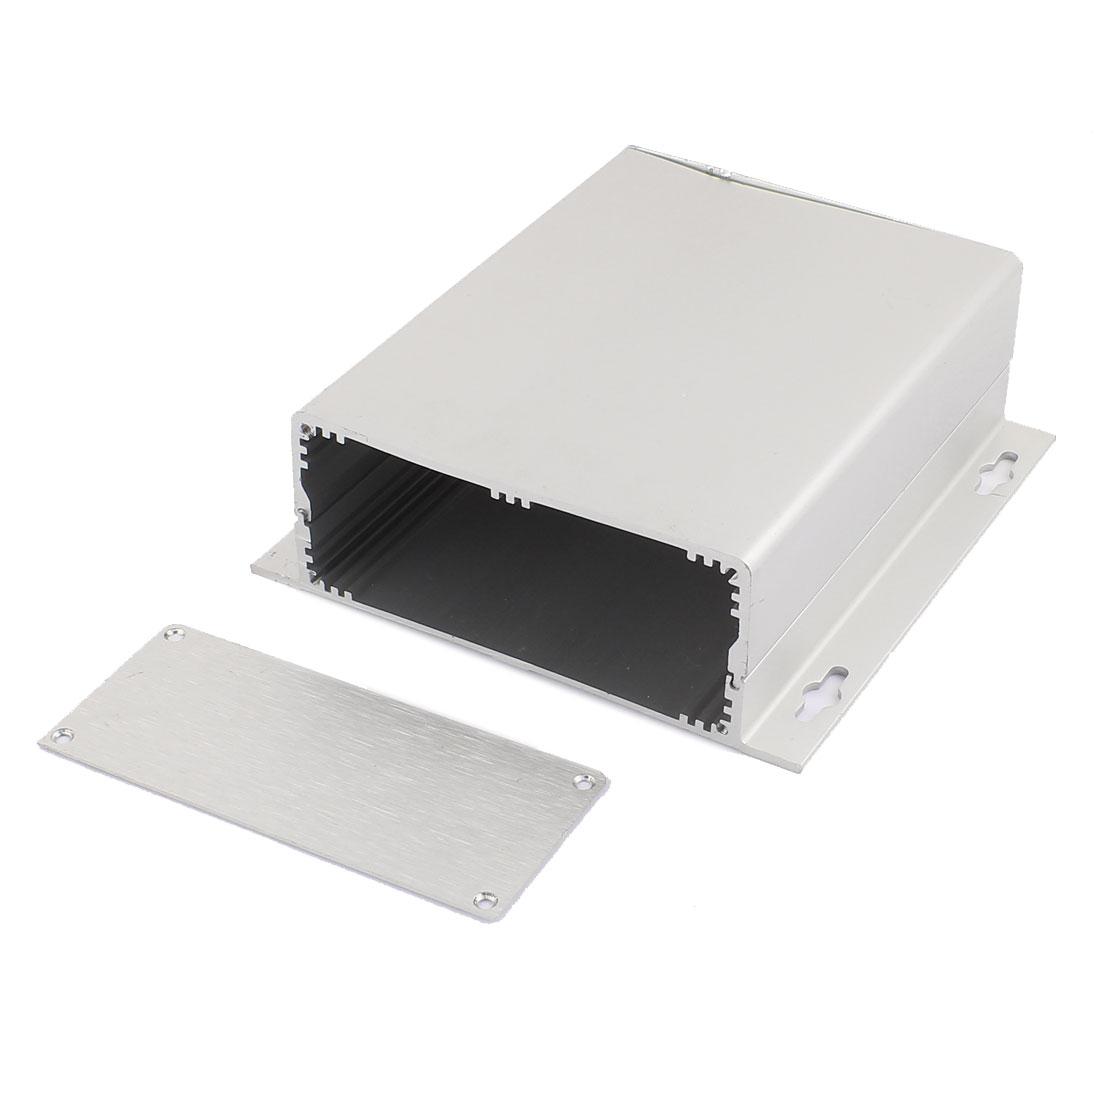 158x150x52mm-Multi-purpose-Electronic-Extruded-Aluminum-Enclosure-Silver-Tone